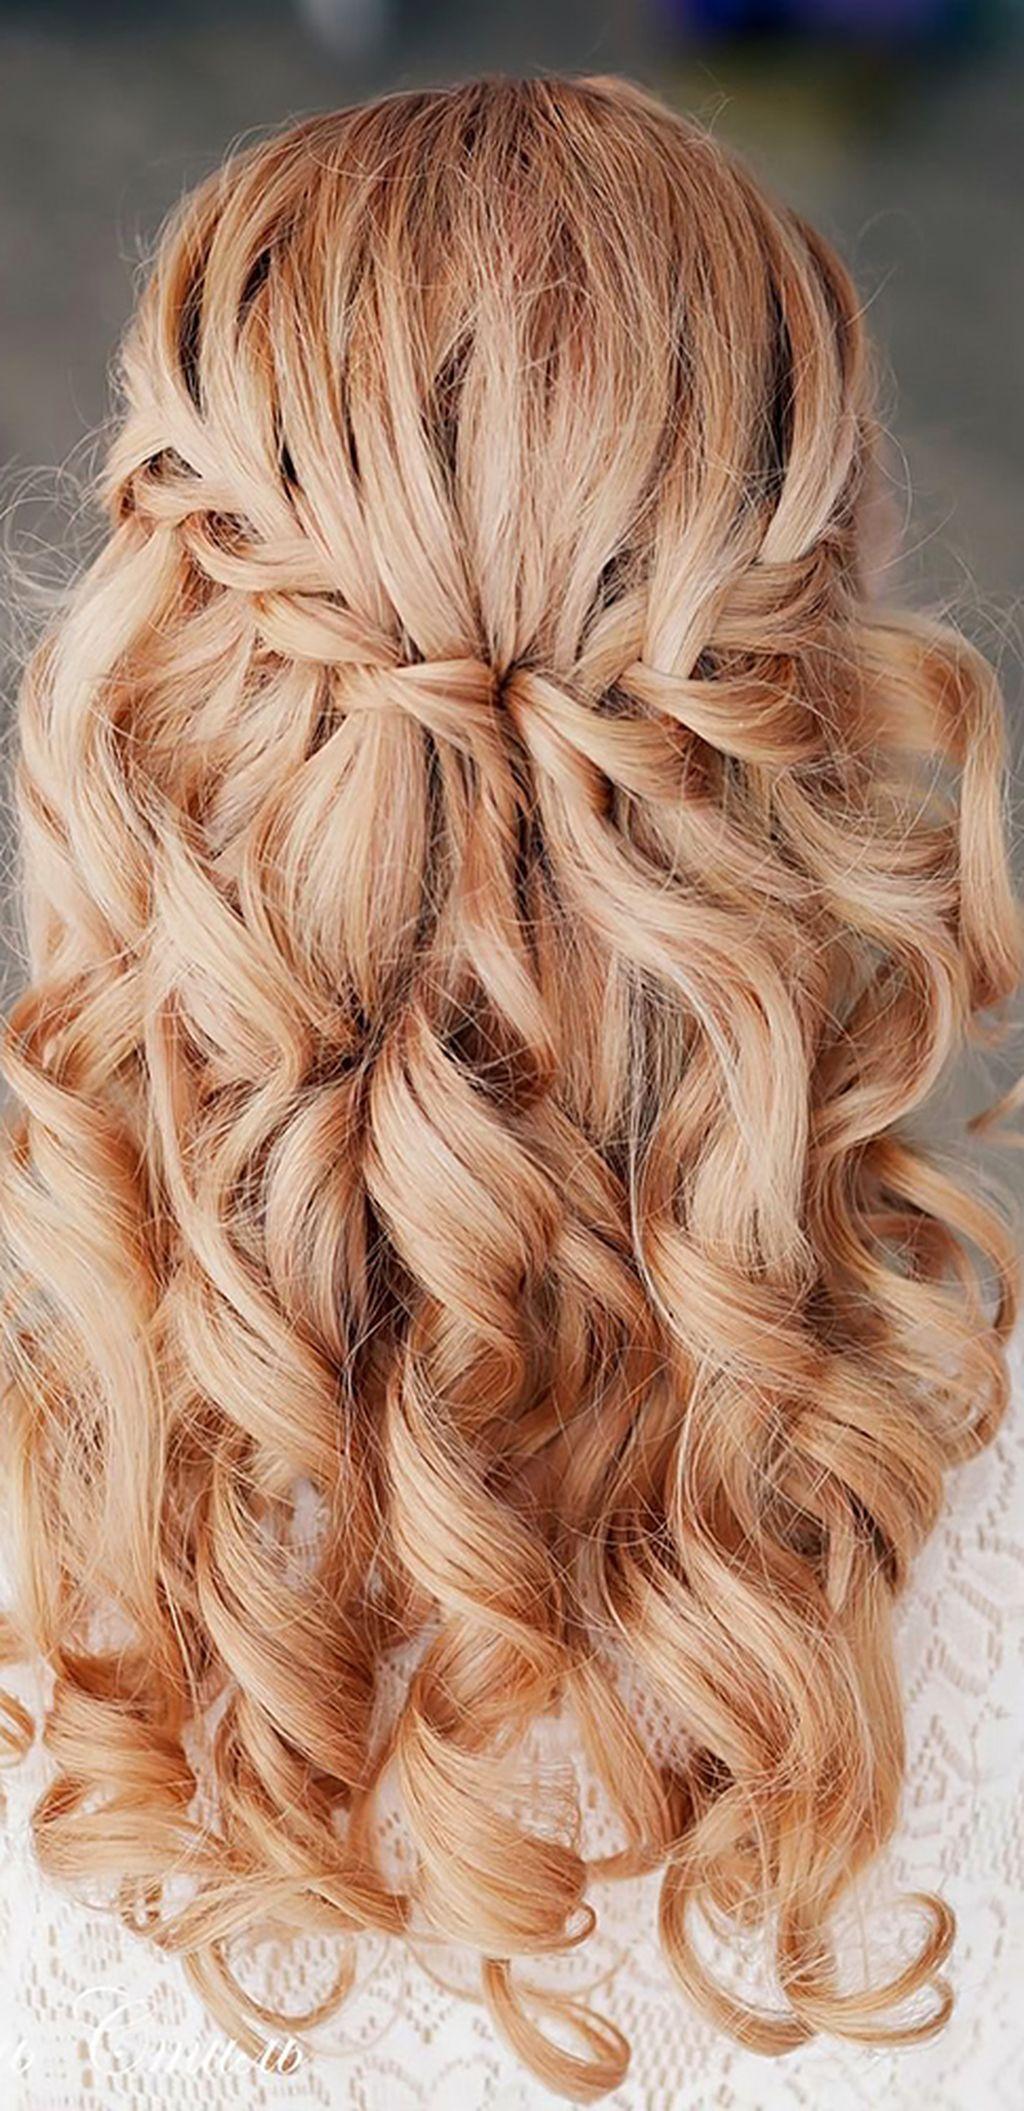 pin by inova professional llc on fun hairstyles! | hair